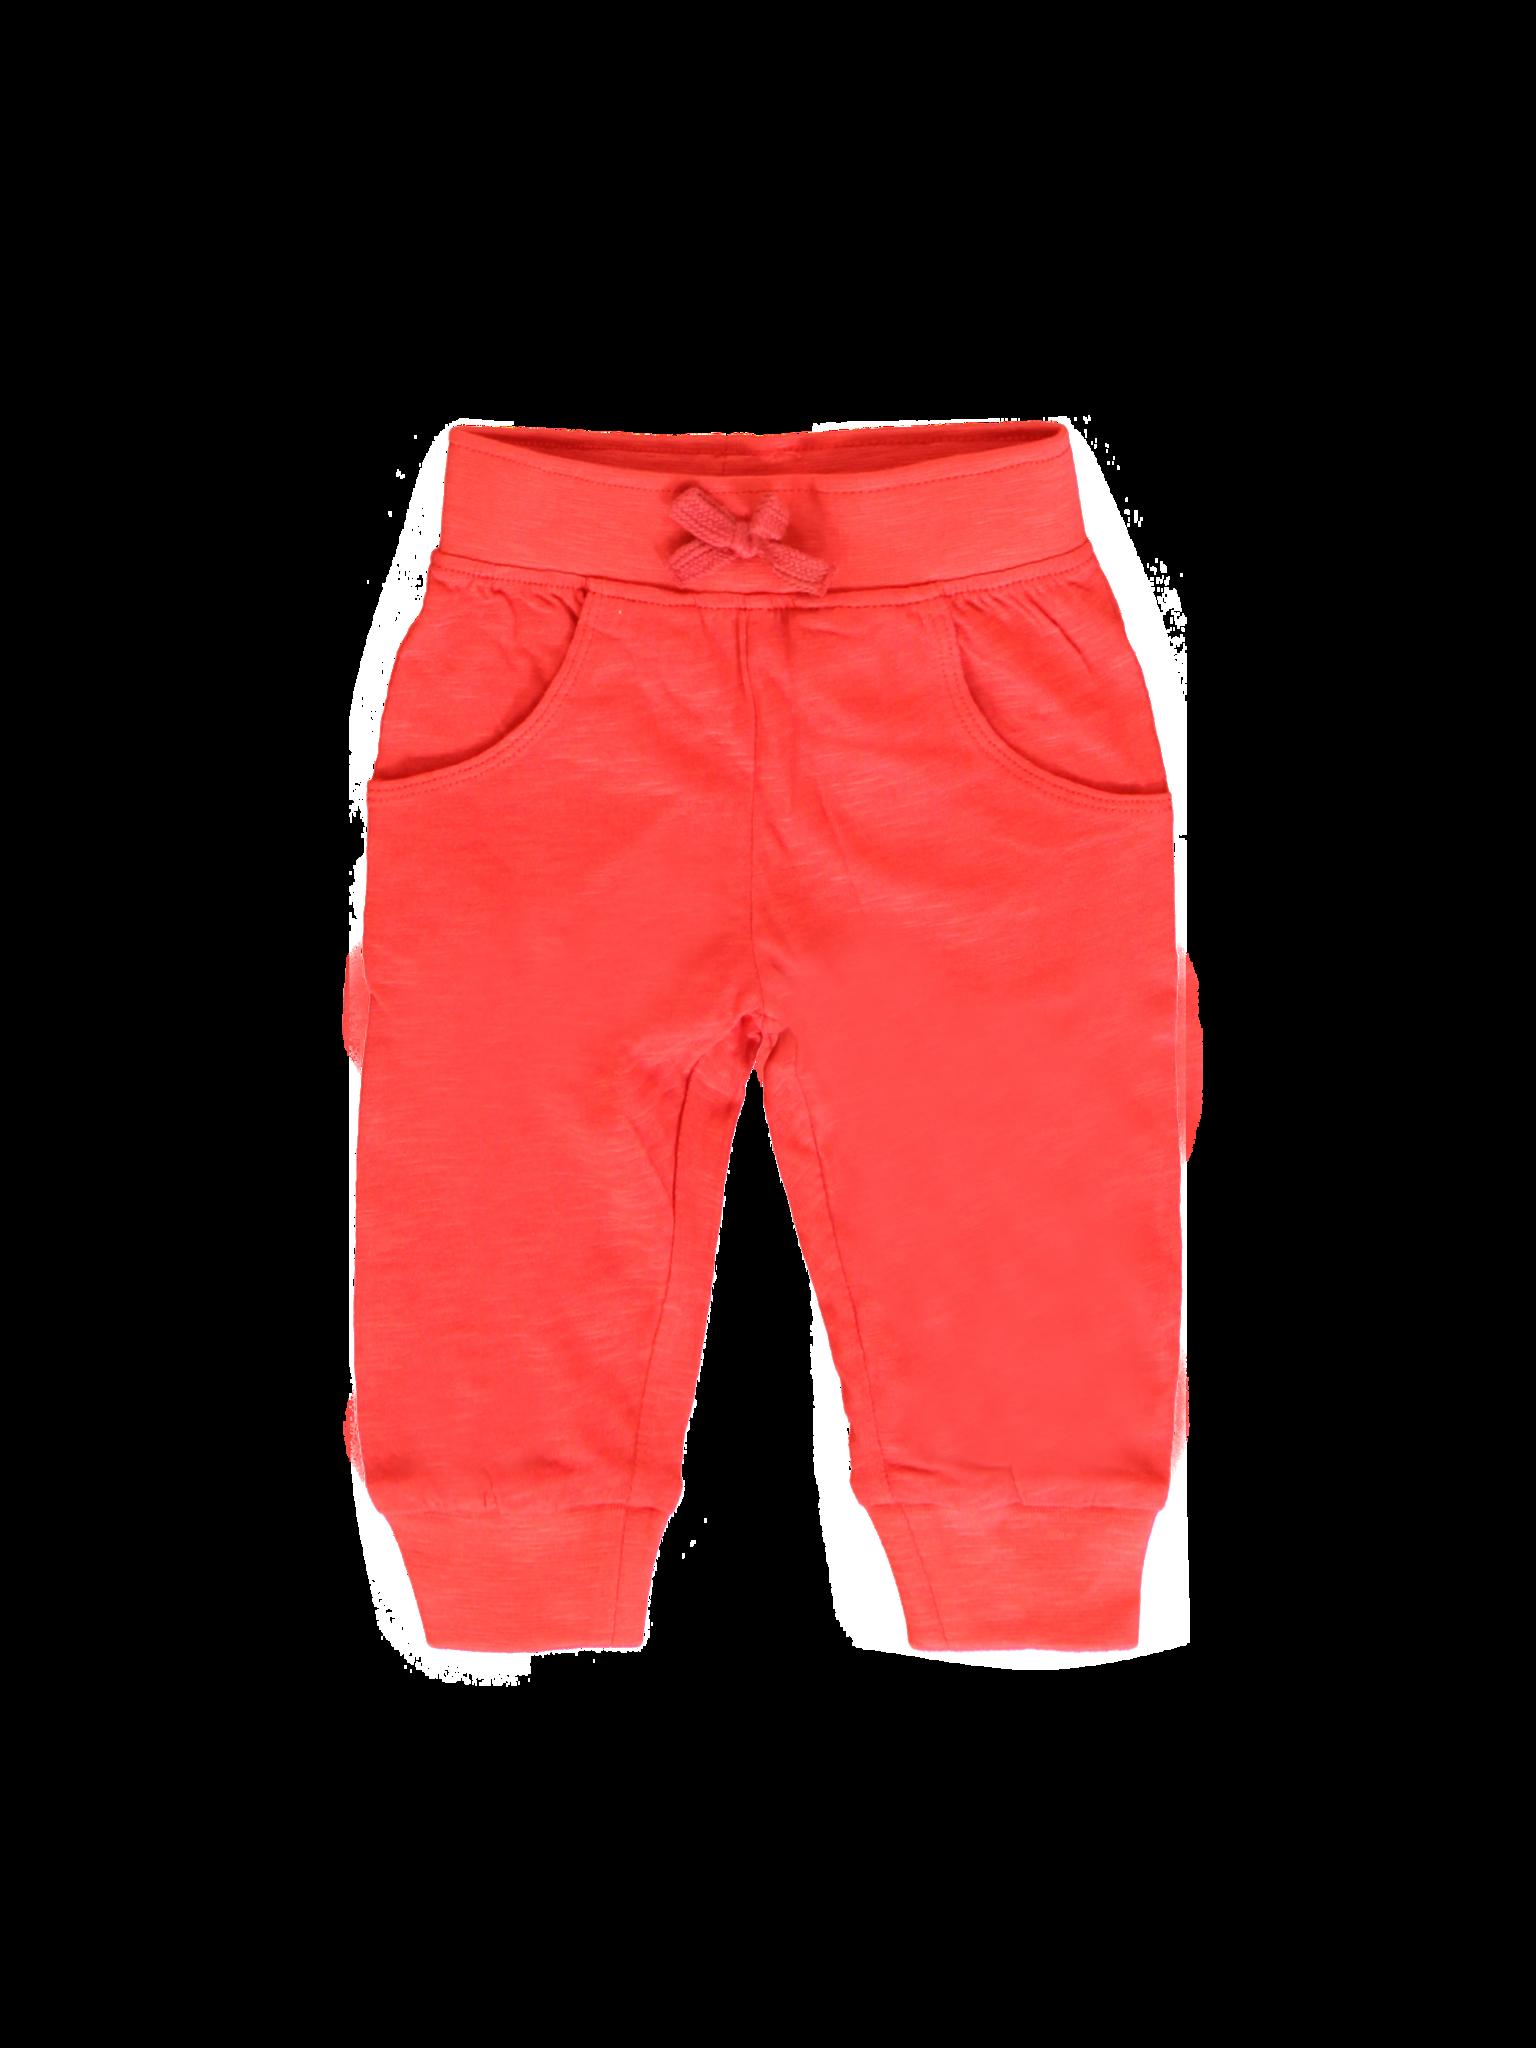 All Brands | Summerproducts Baby | Jogging Pant | 12 pcs/box